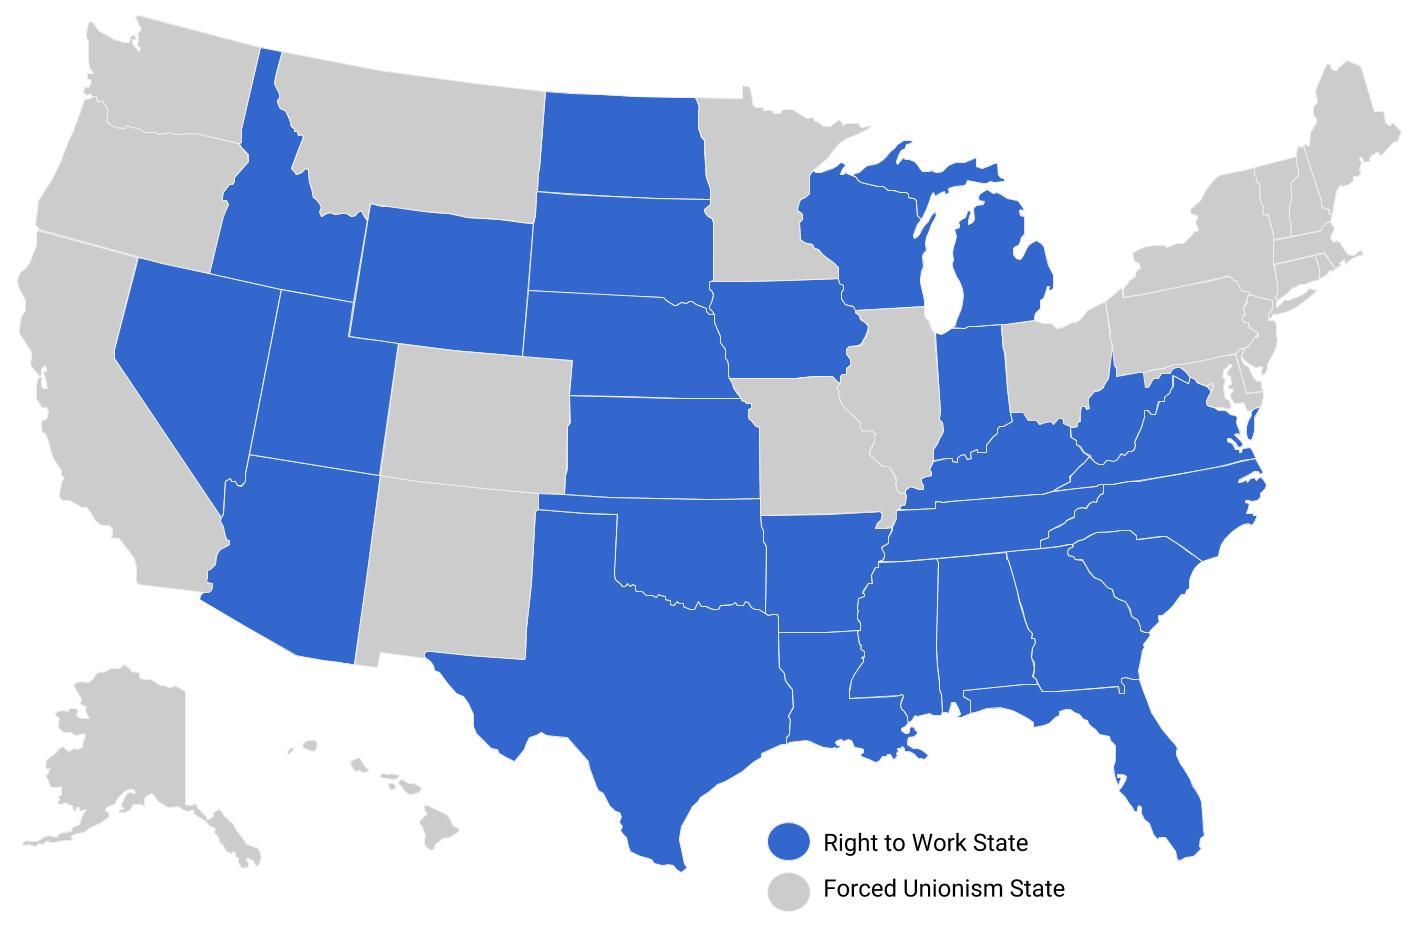 Us Map Of Right To Work States National Right to Work Foundation Estados con Derecho al Trabajo